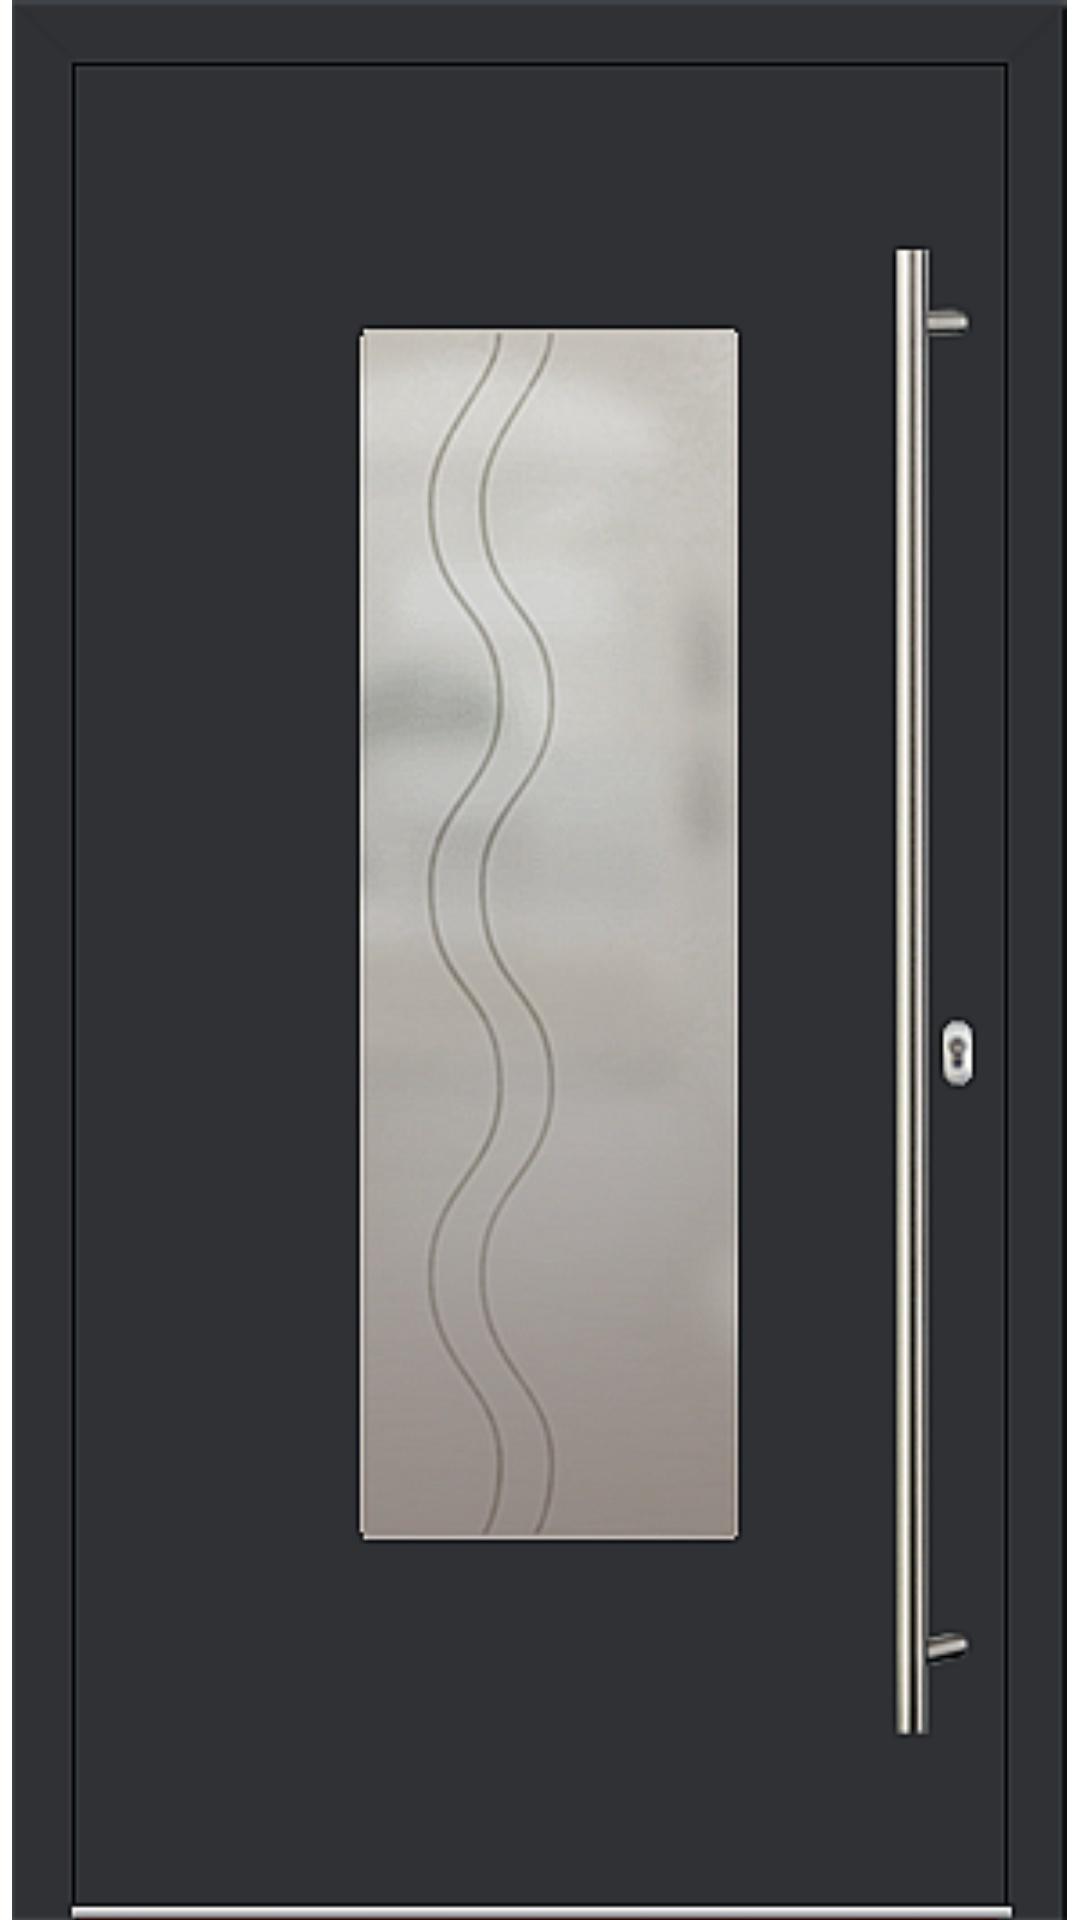 PaXentrée Aluminium Haustür M01220 schwarz